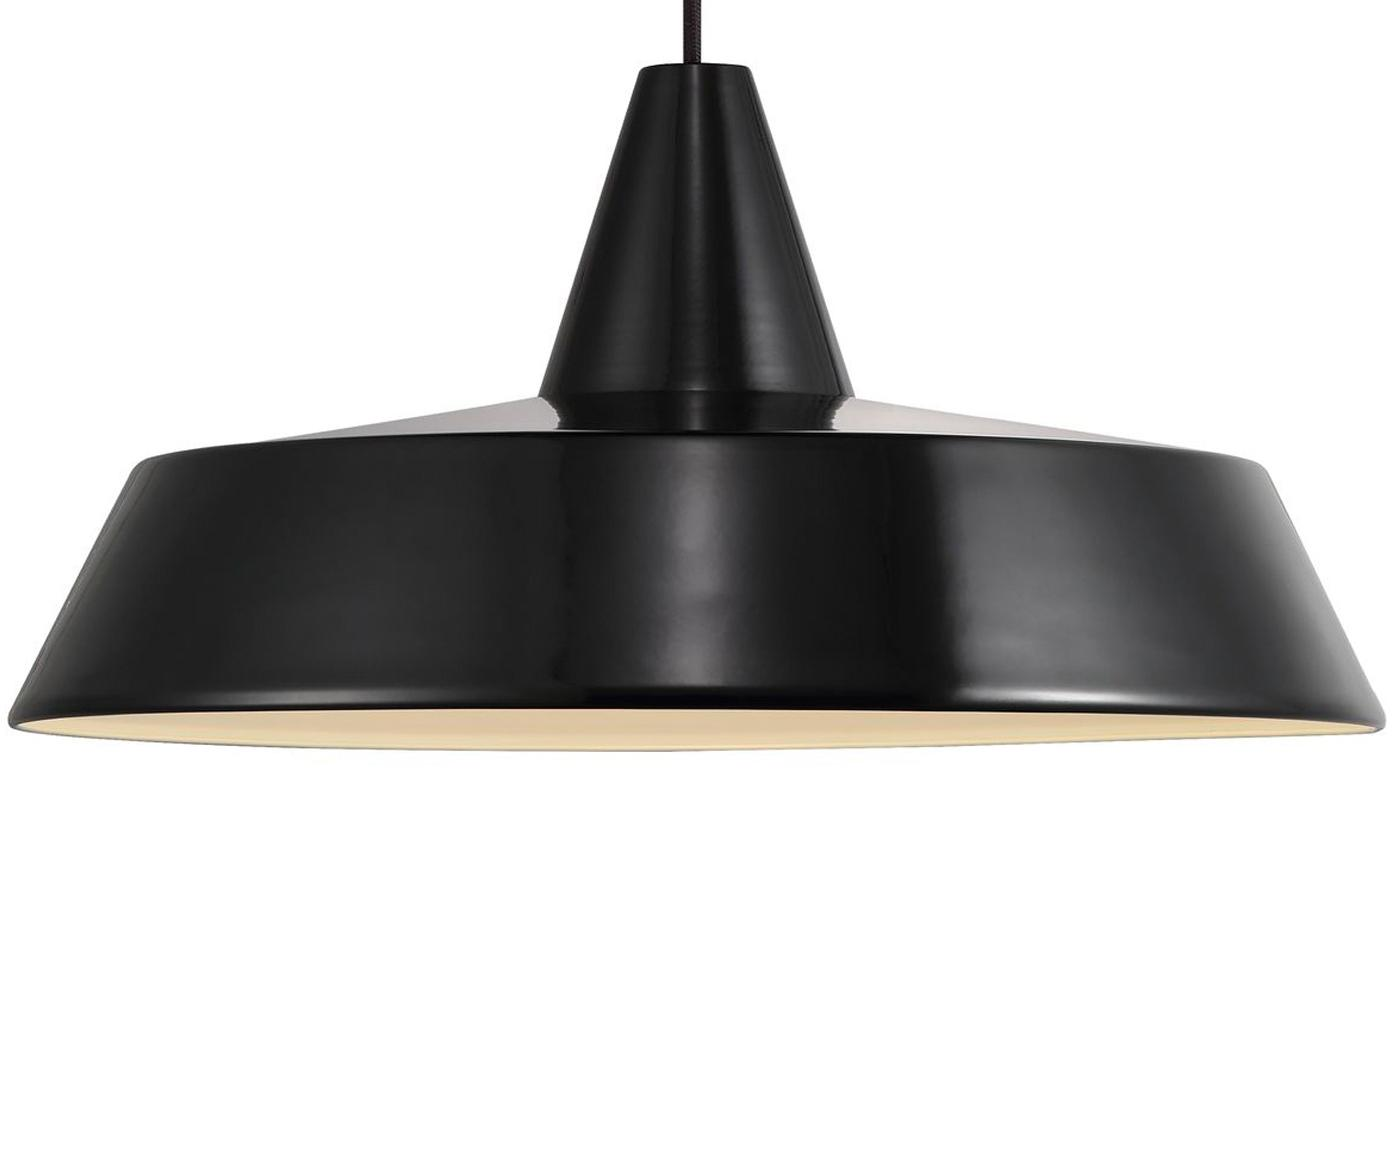 Lampa wisząca Jubilee, Czarny, Ø 40 x 20 cm